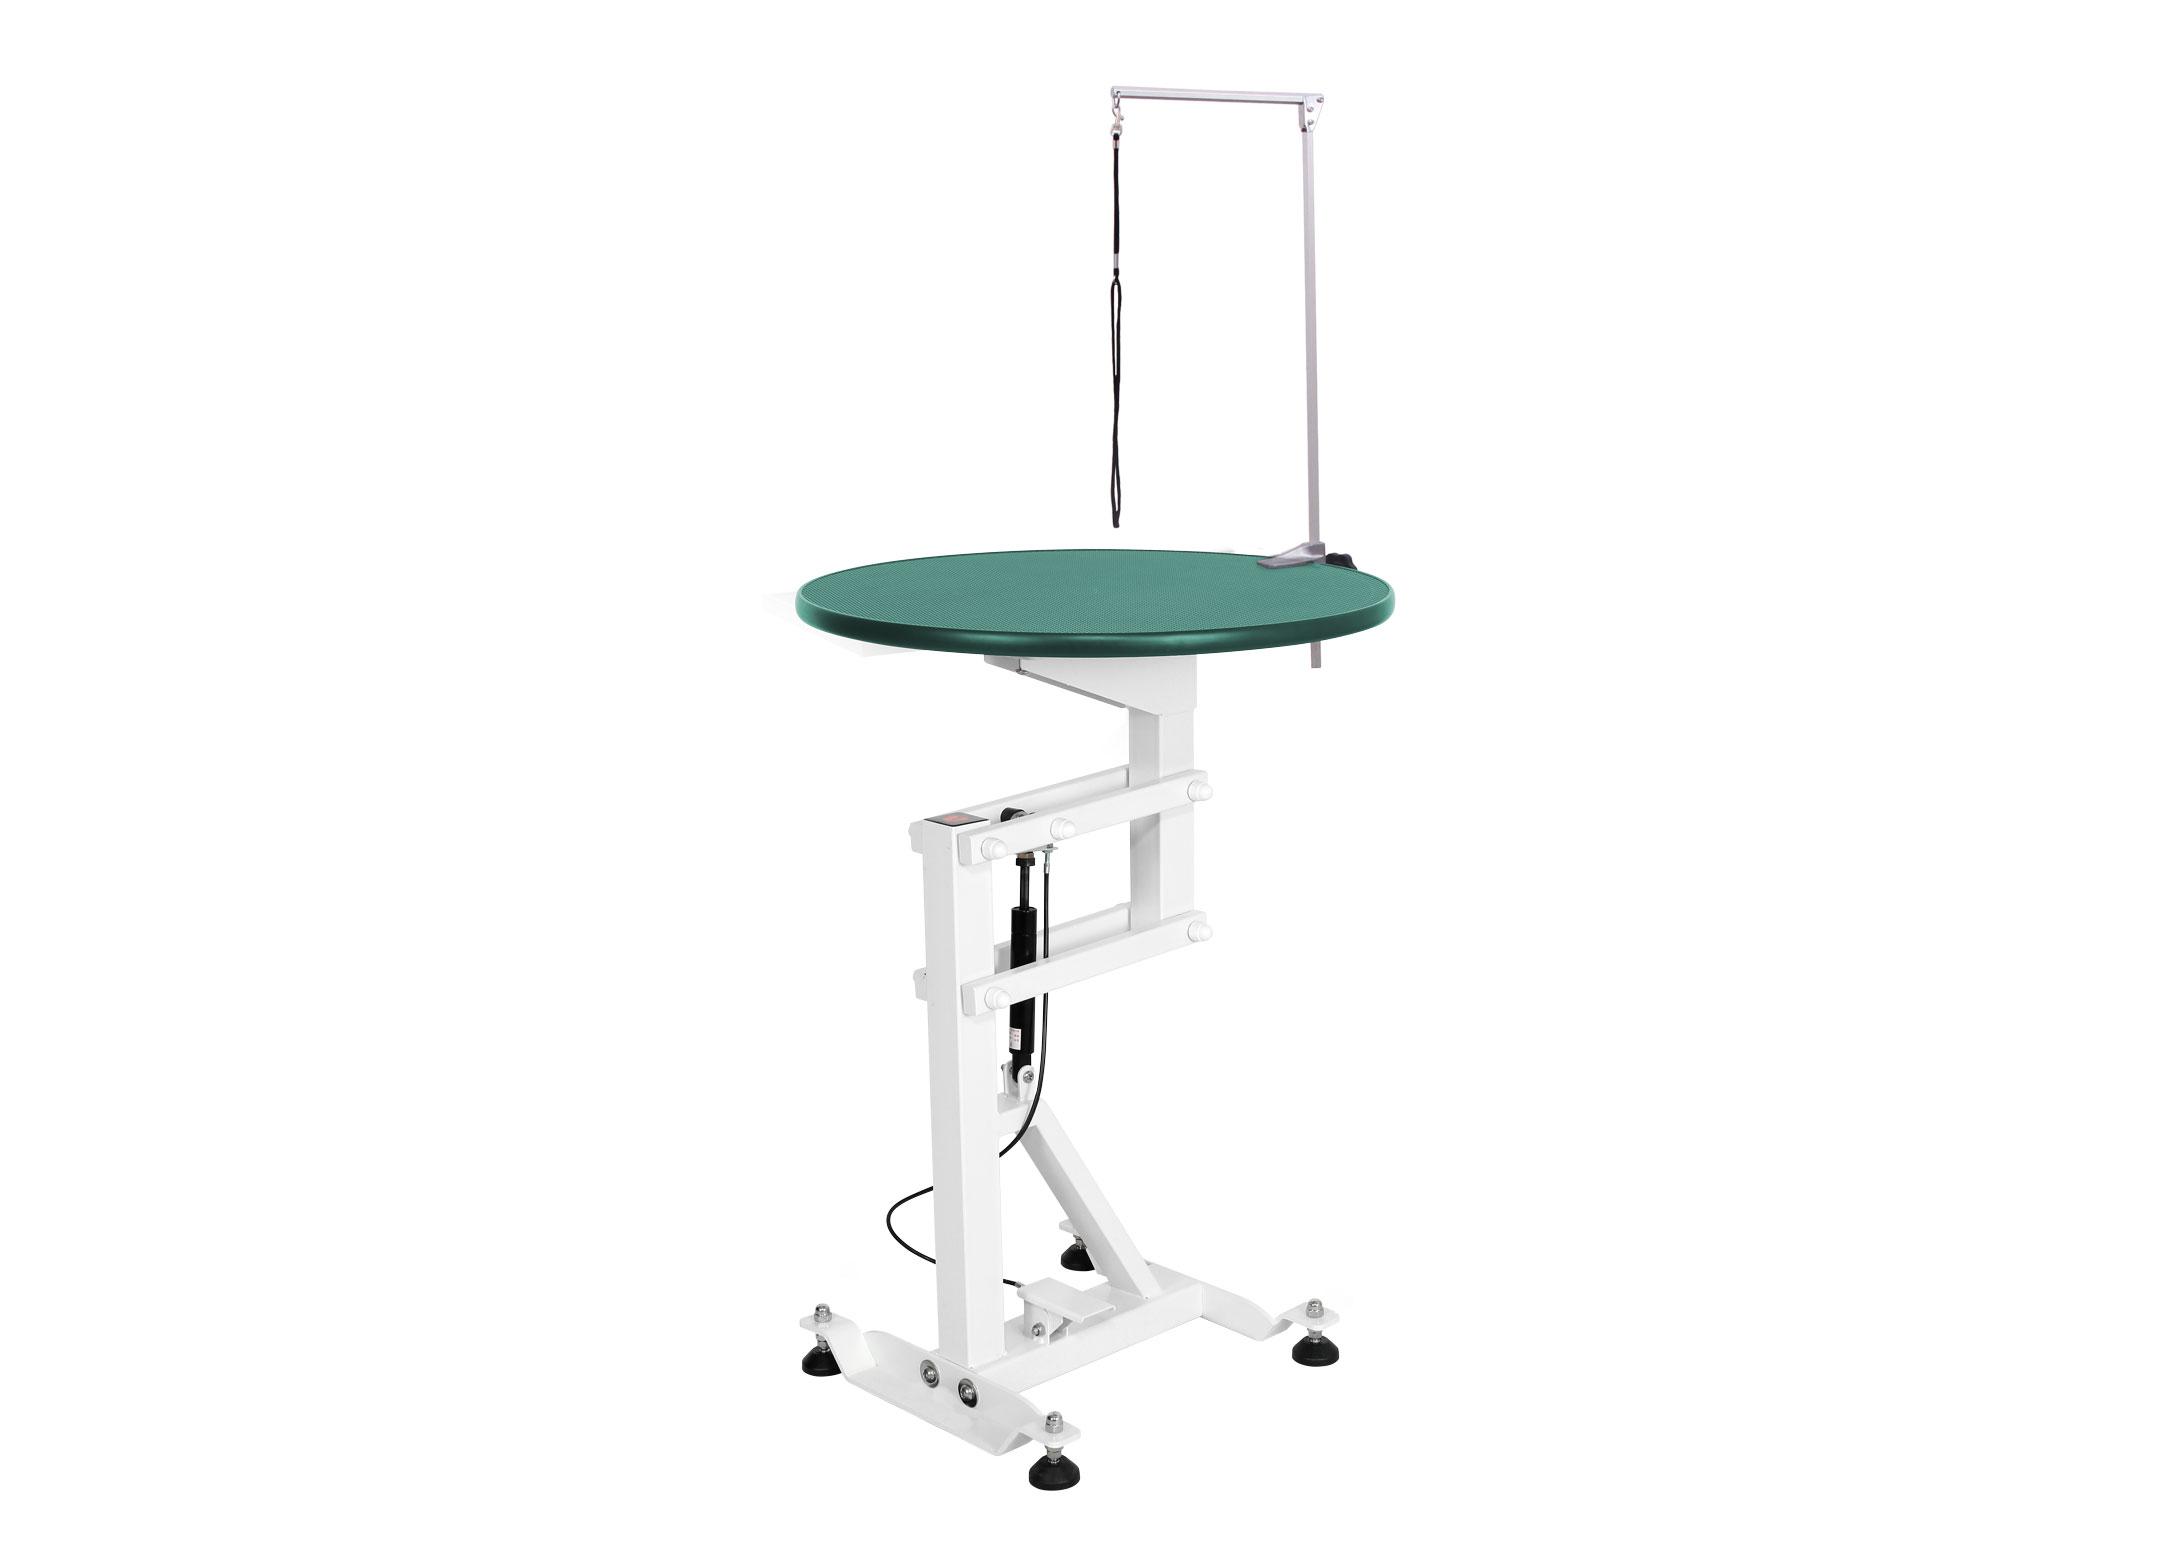 Groom-X Compact Air Lift Table de Toilettage Ronde dia.60x80-120cmh avec Potence